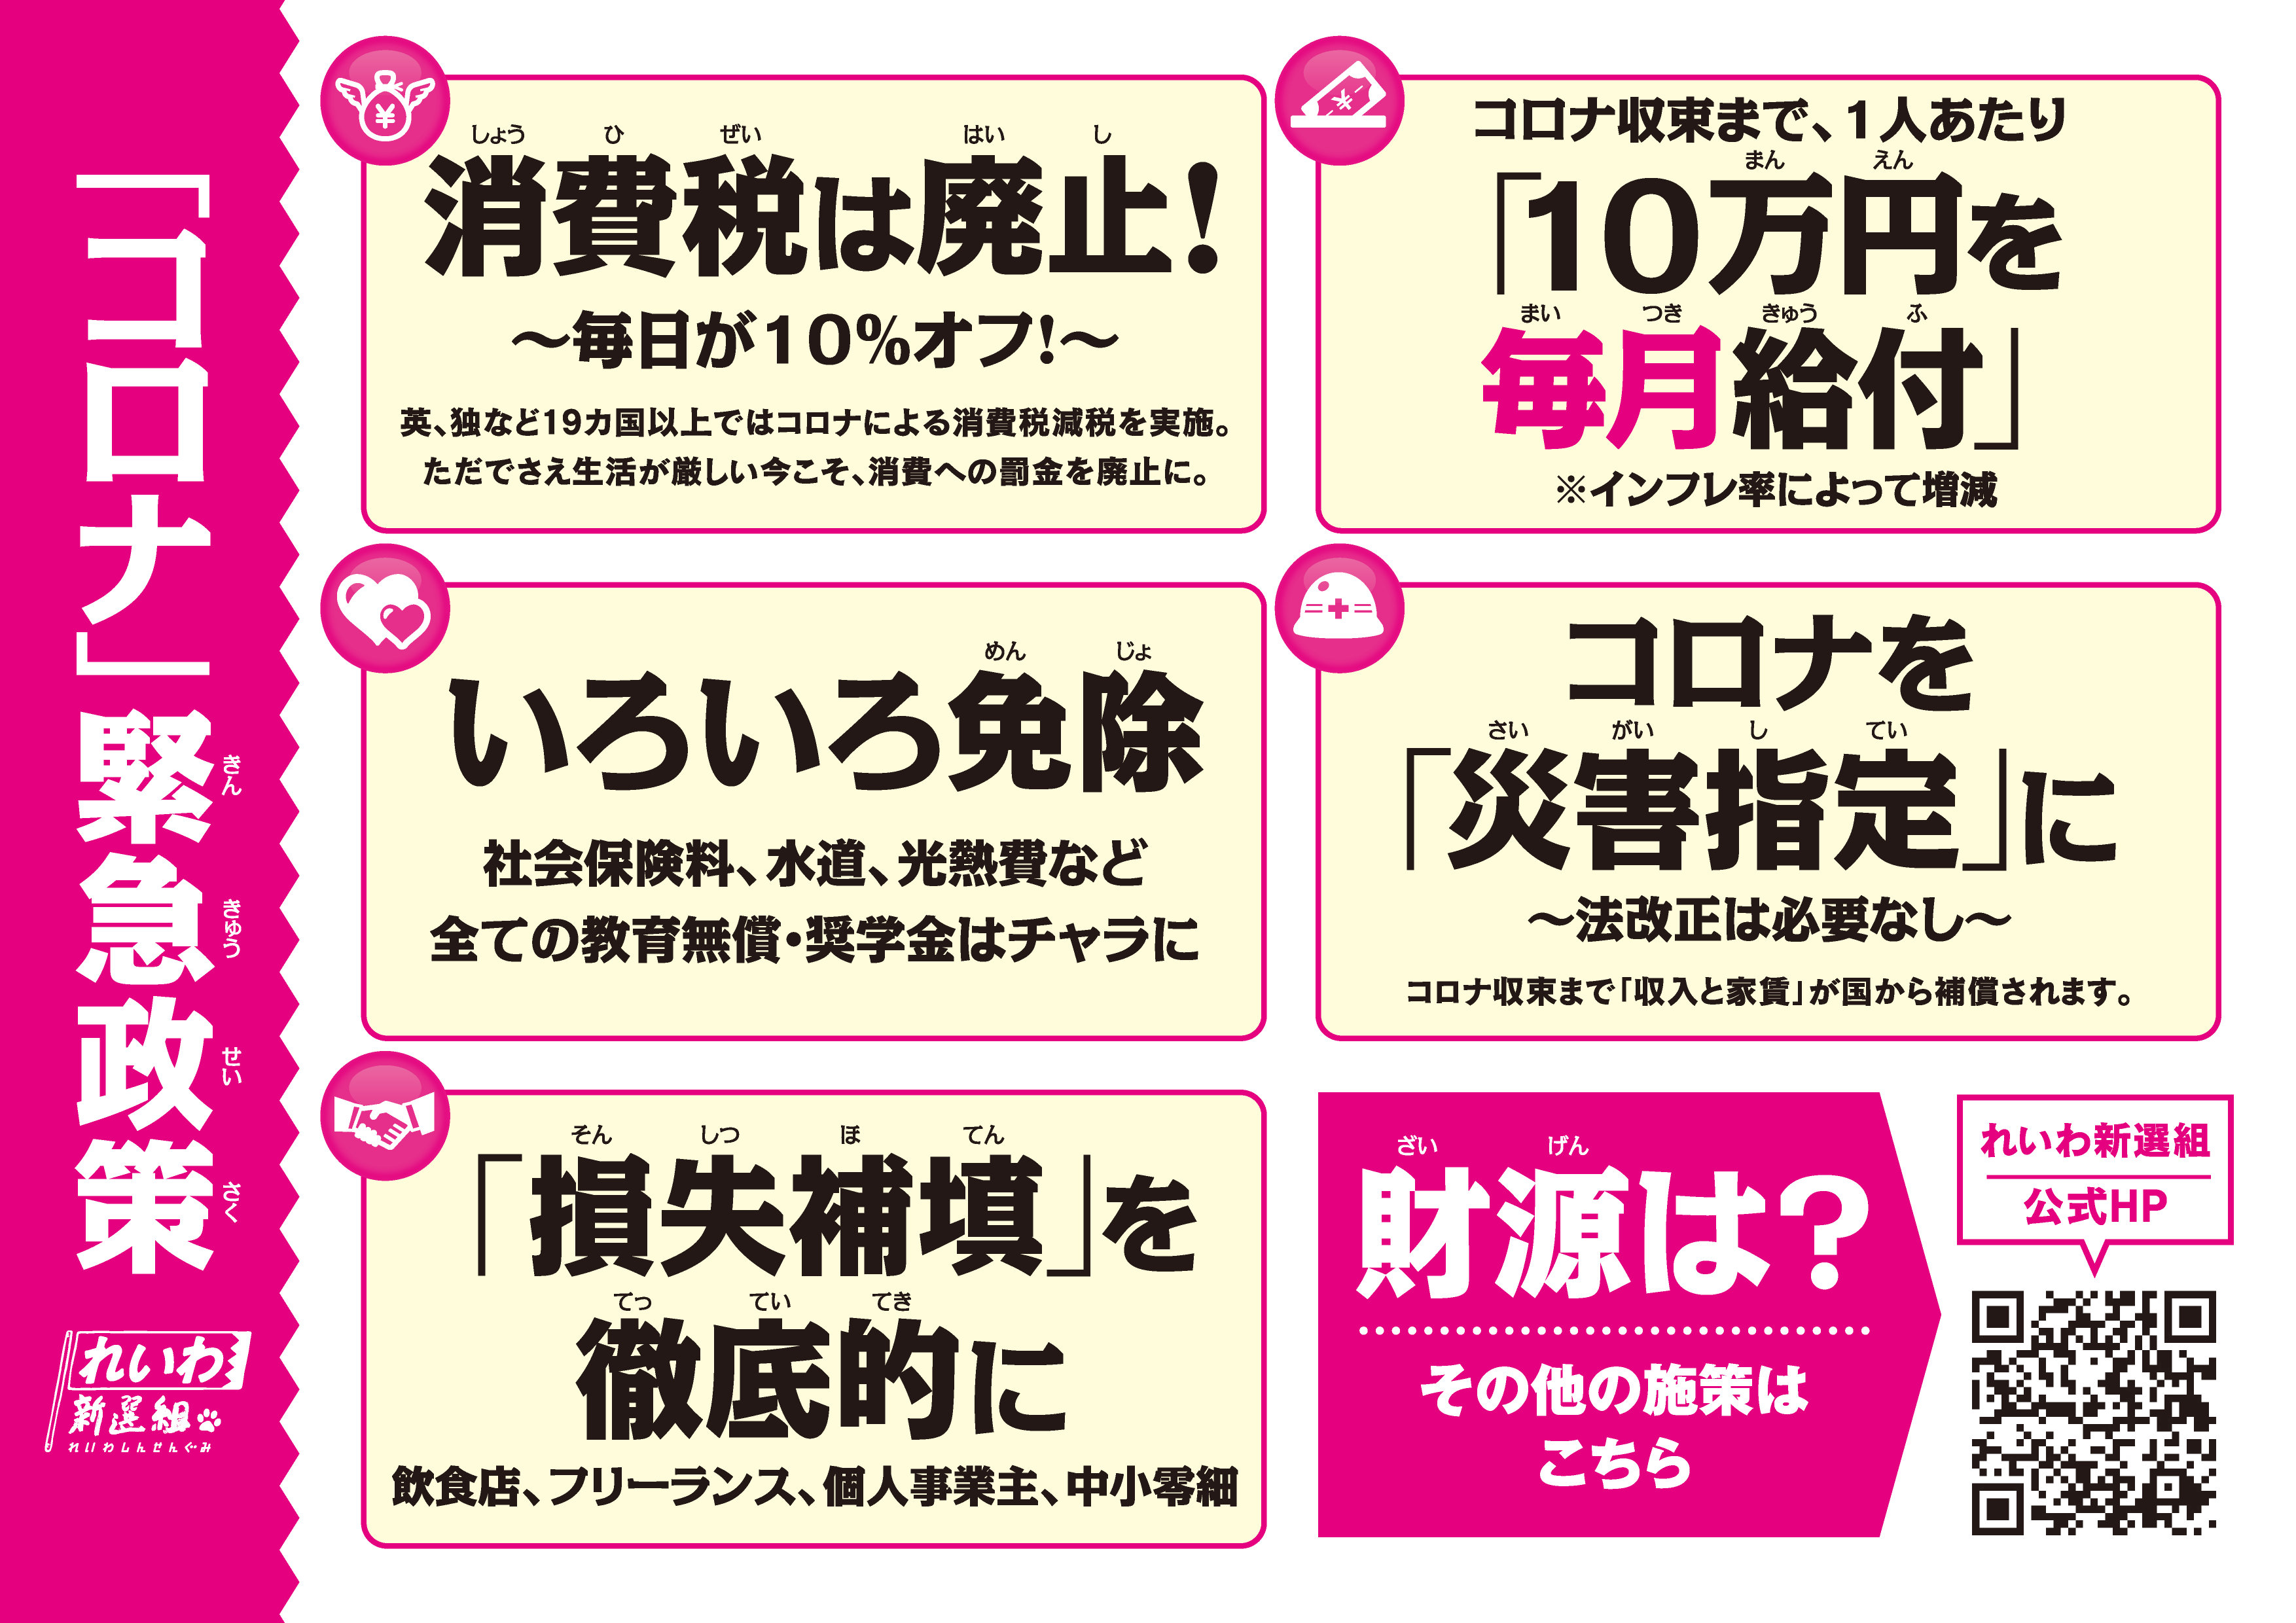 https://reiwa-shinsengumi.com/wp-content/uploads/2020/09/A4-02.png